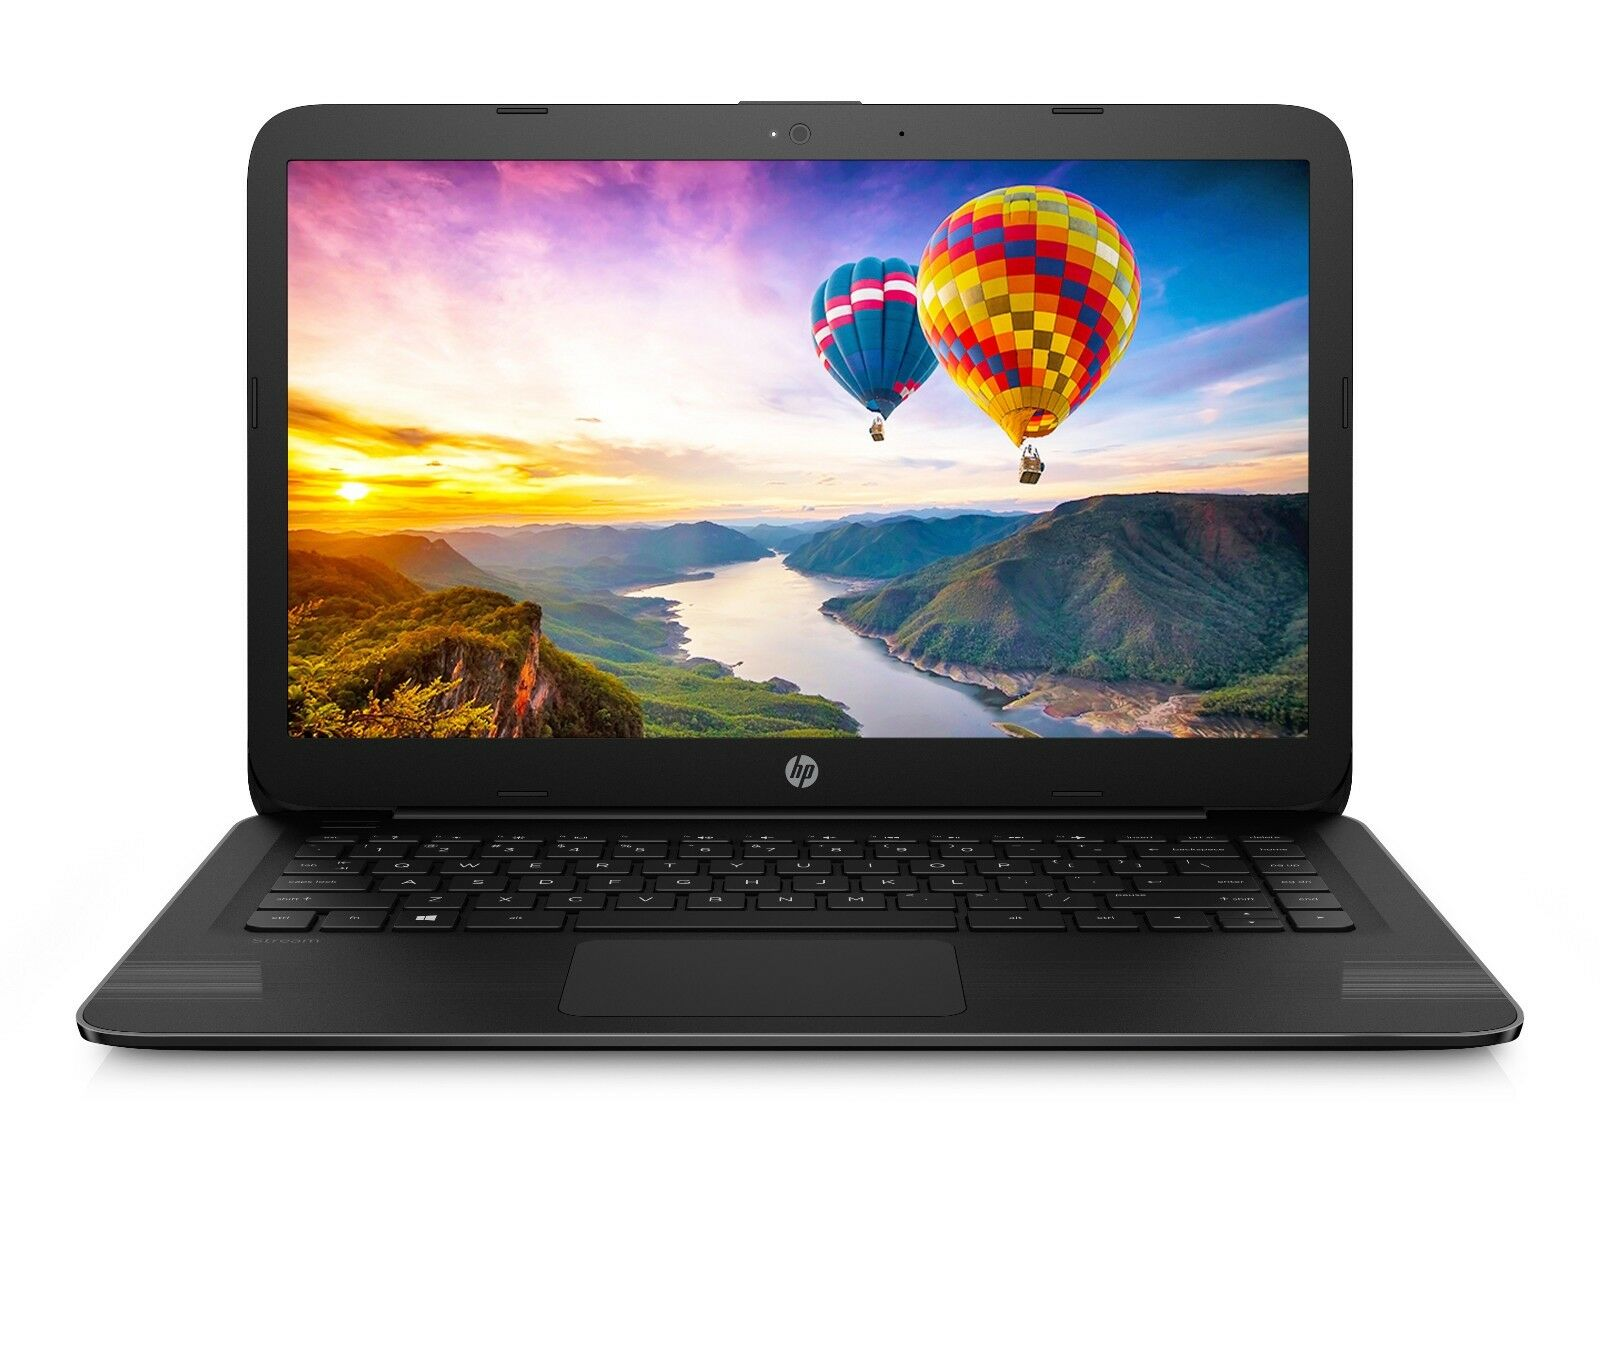 $239.99 - New HP 14